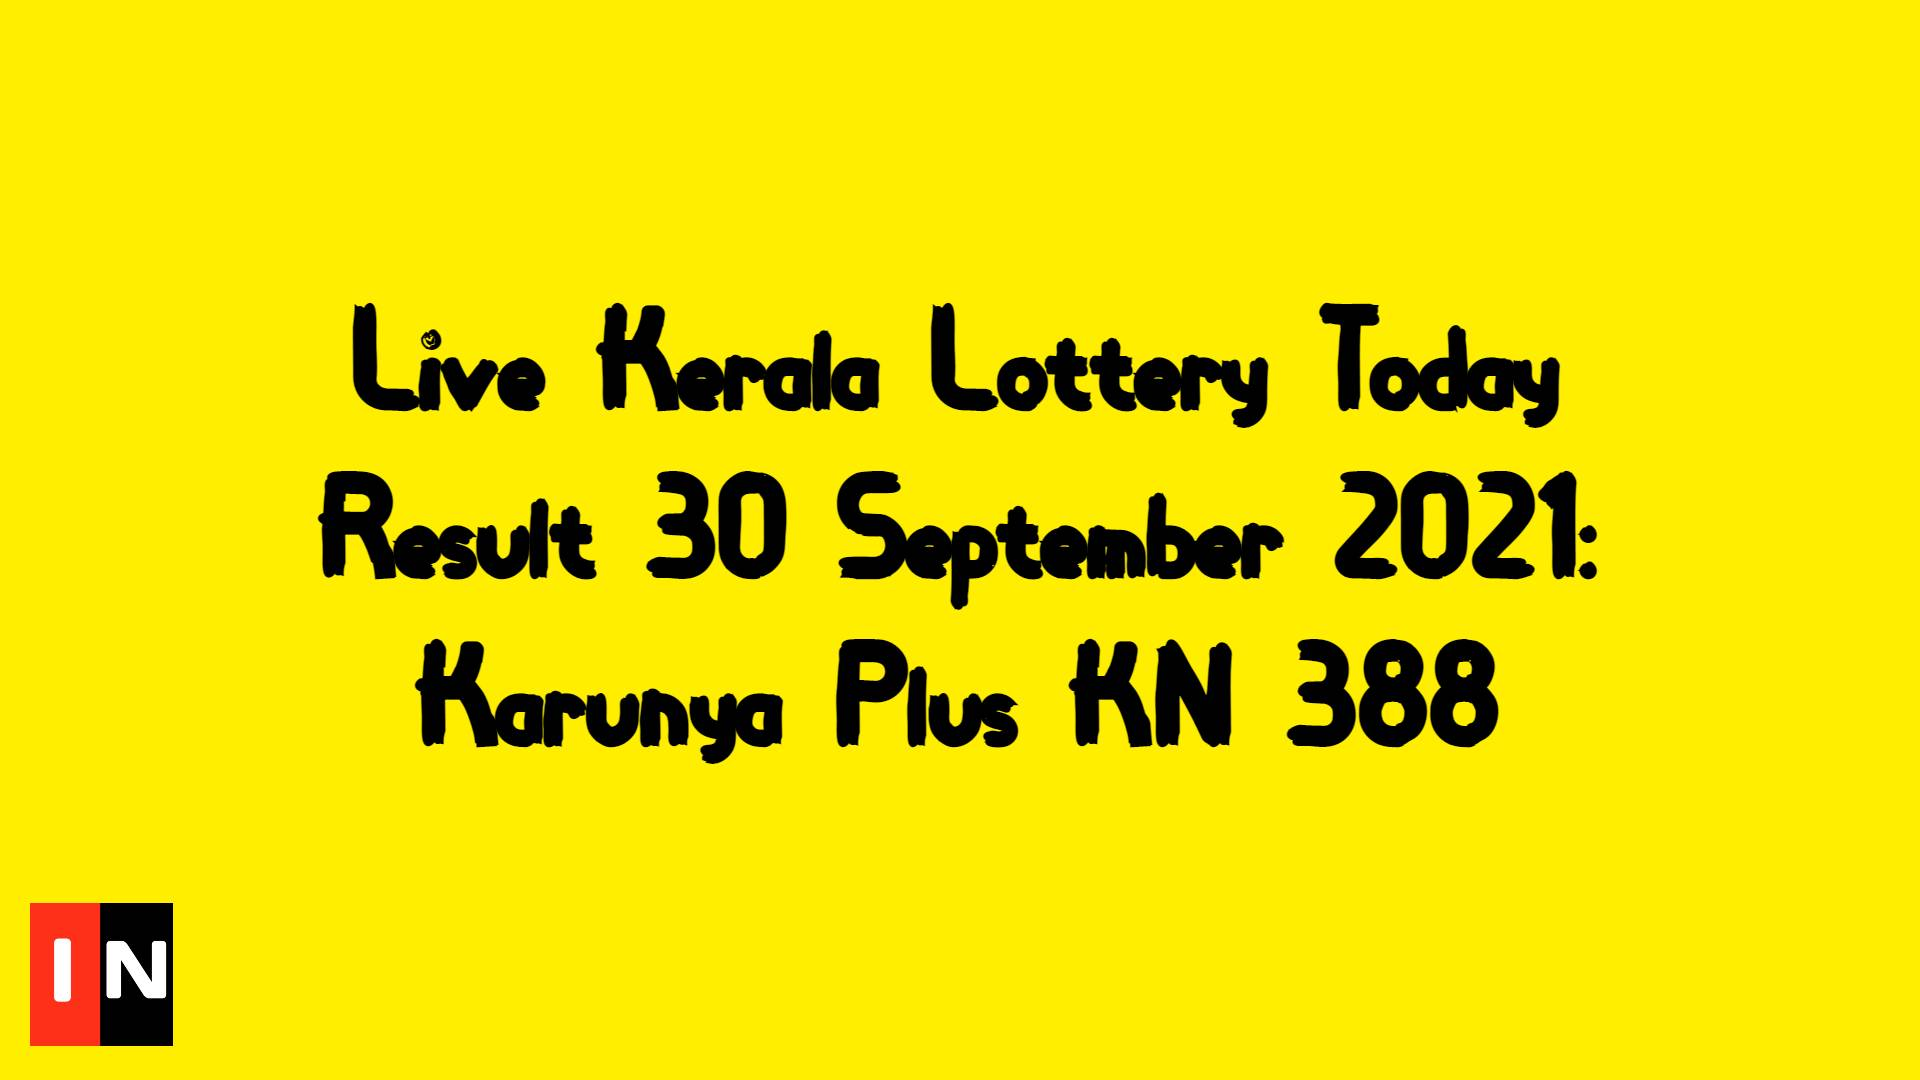 Live Kerala Lottery Today Result 30 September 2021: Karunya Plus KN 388